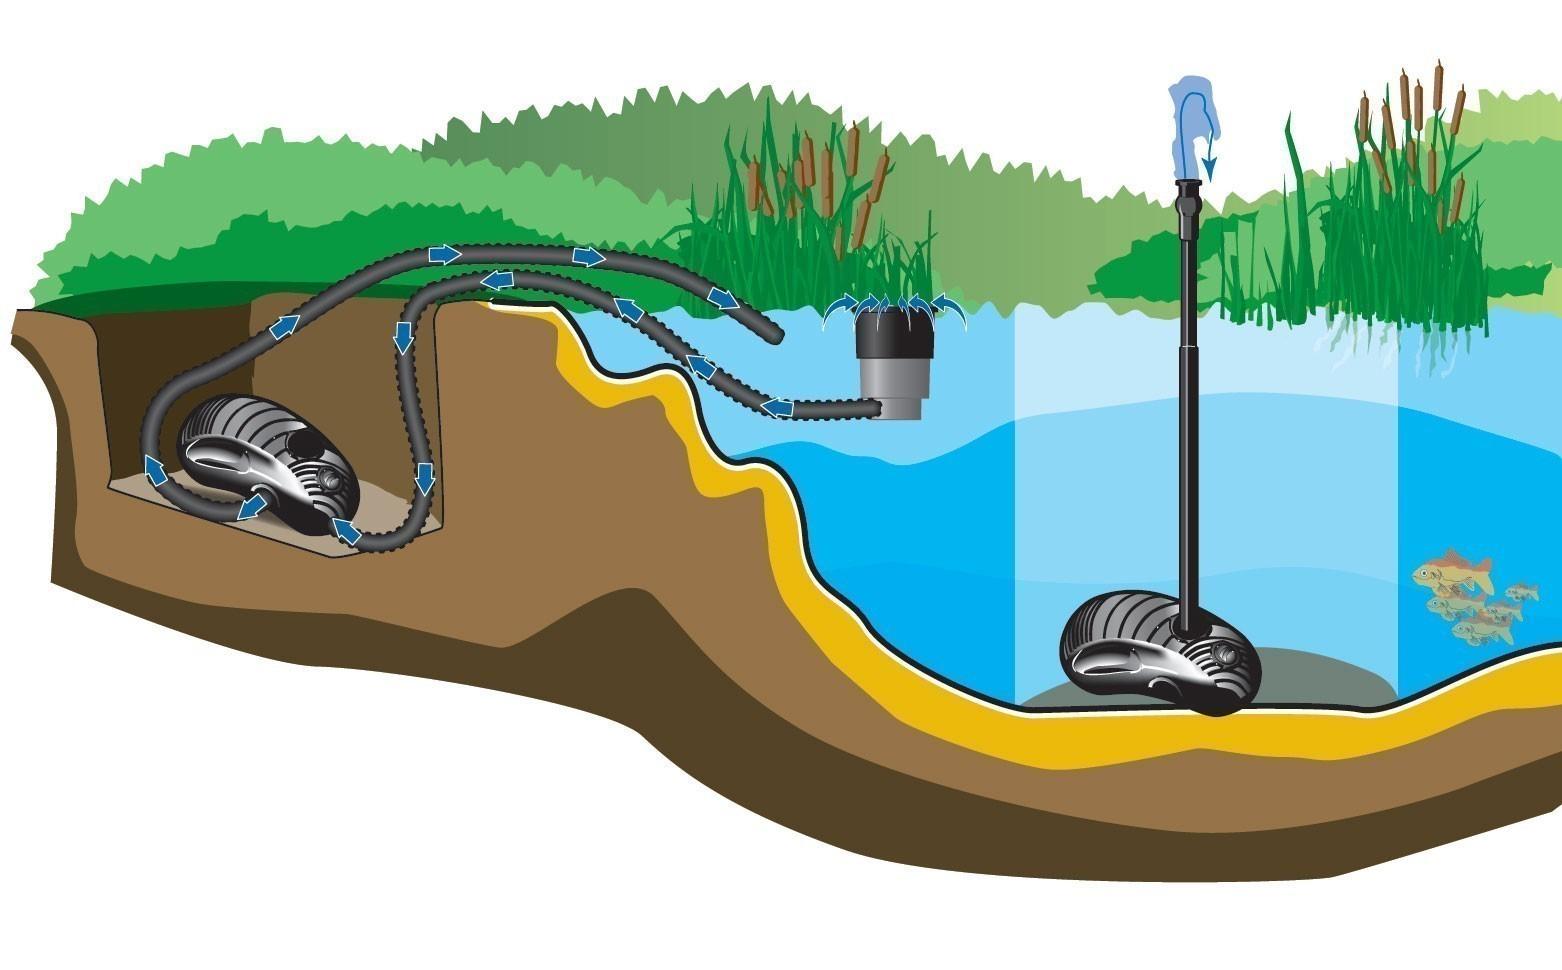 Filterpumpe Bachlaufpumpe Heissner Aqua Craft ECO P 20100E-00 Bild 3